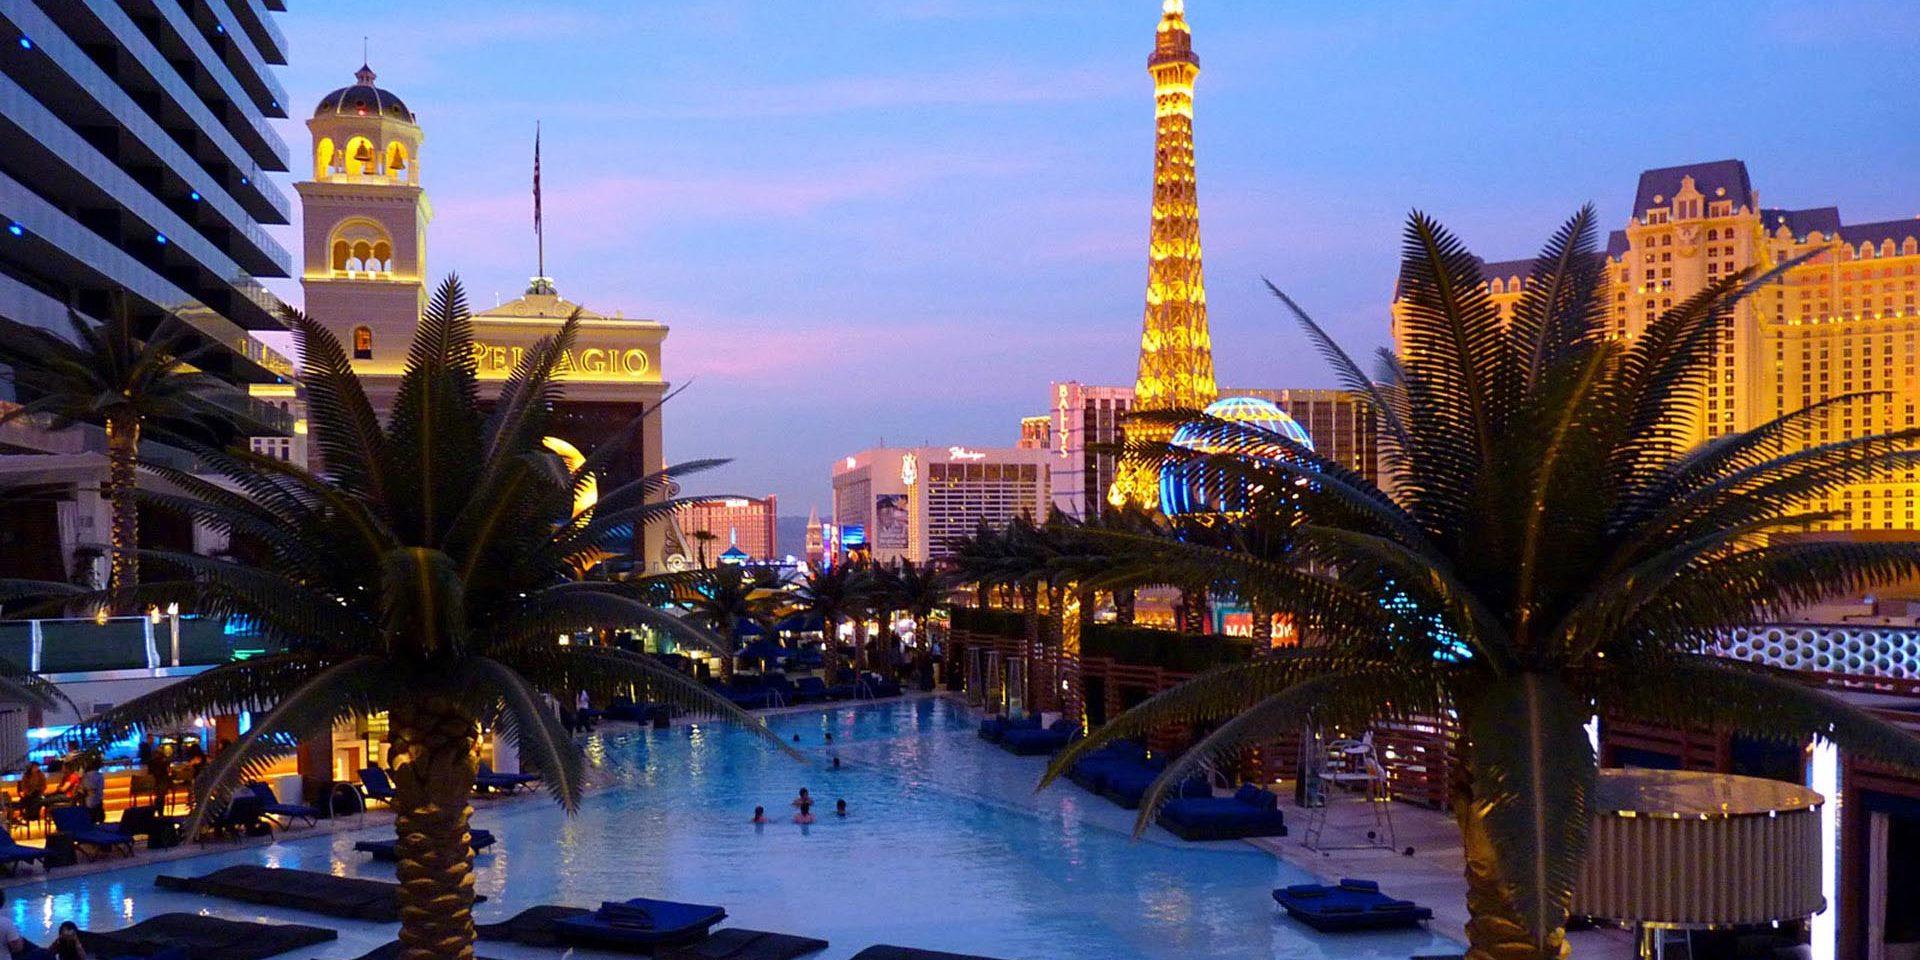 Las Vegas Pools To Make You Say Quot Viva Las Vegas Quot